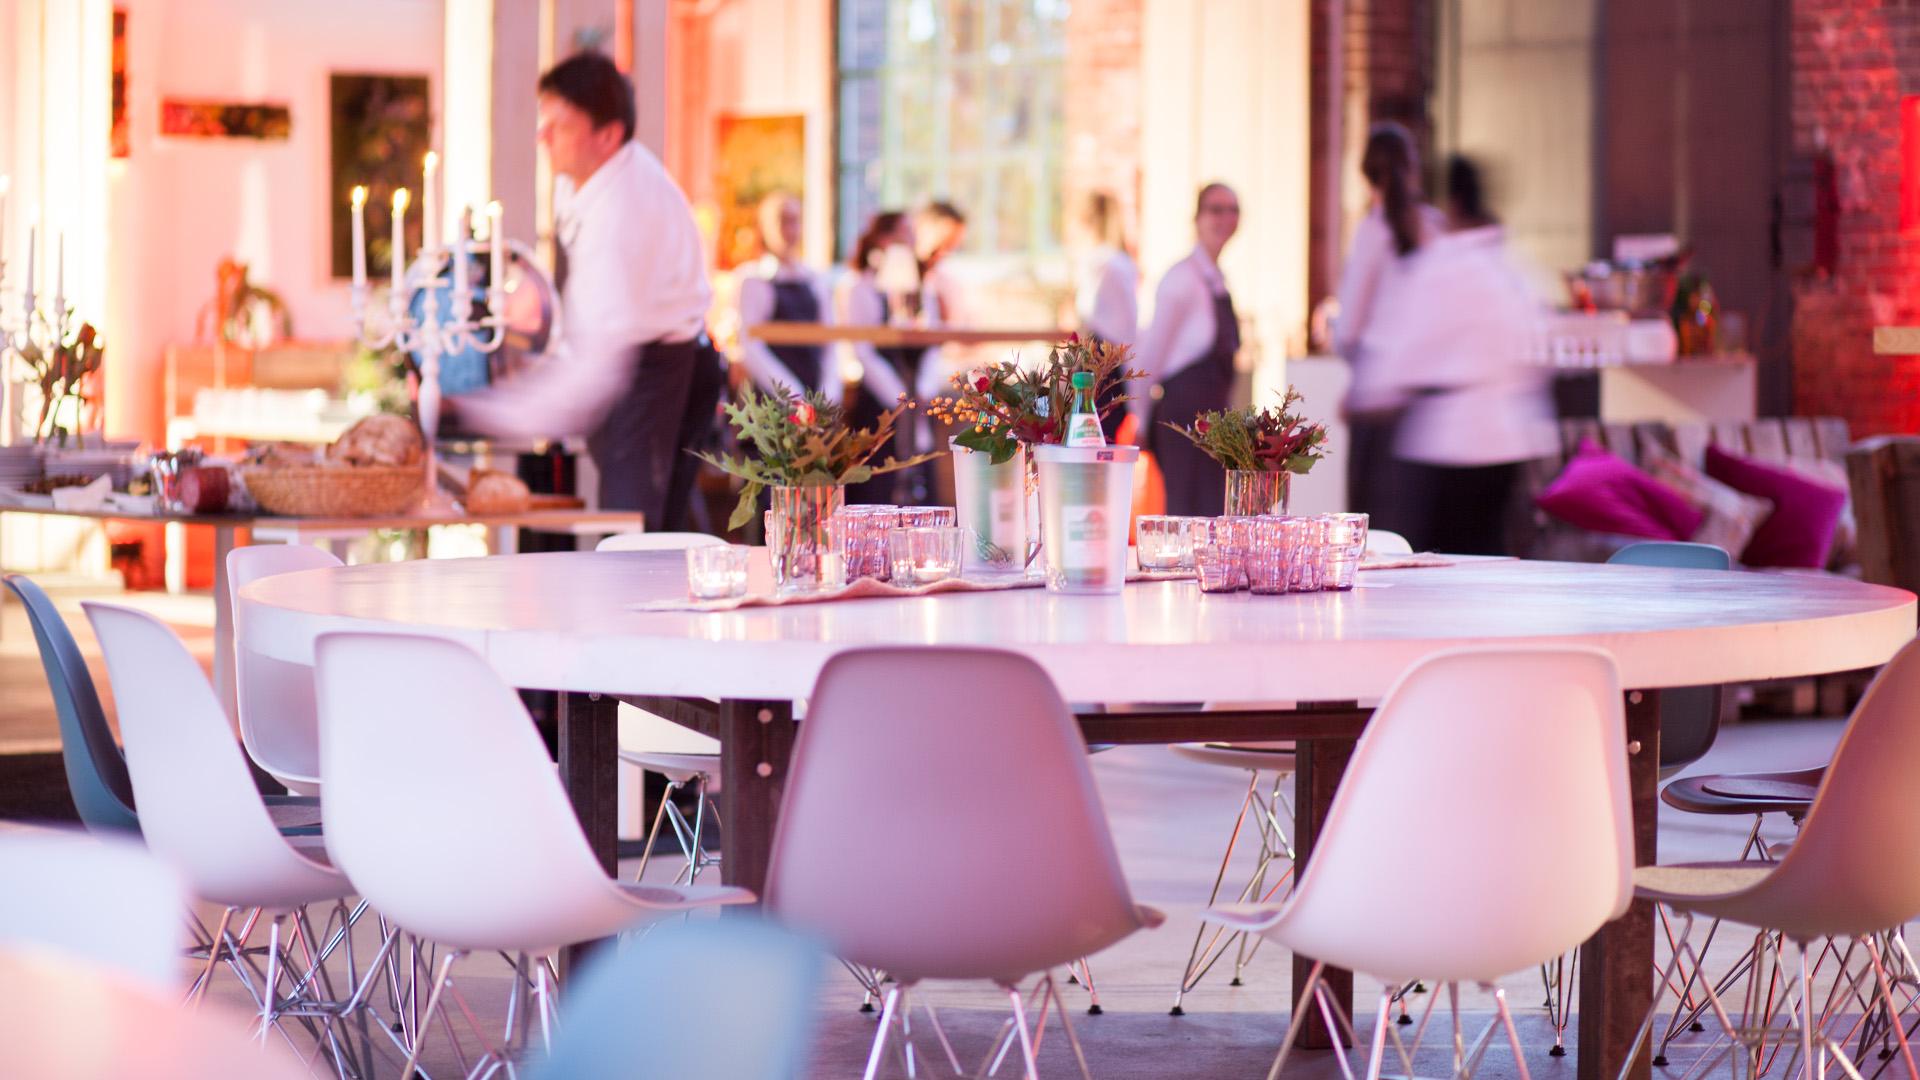 deutsche k che restaurant dortmund alno k che ikea metod bodbyn outdoor planen online sitzbank. Black Bedroom Furniture Sets. Home Design Ideas